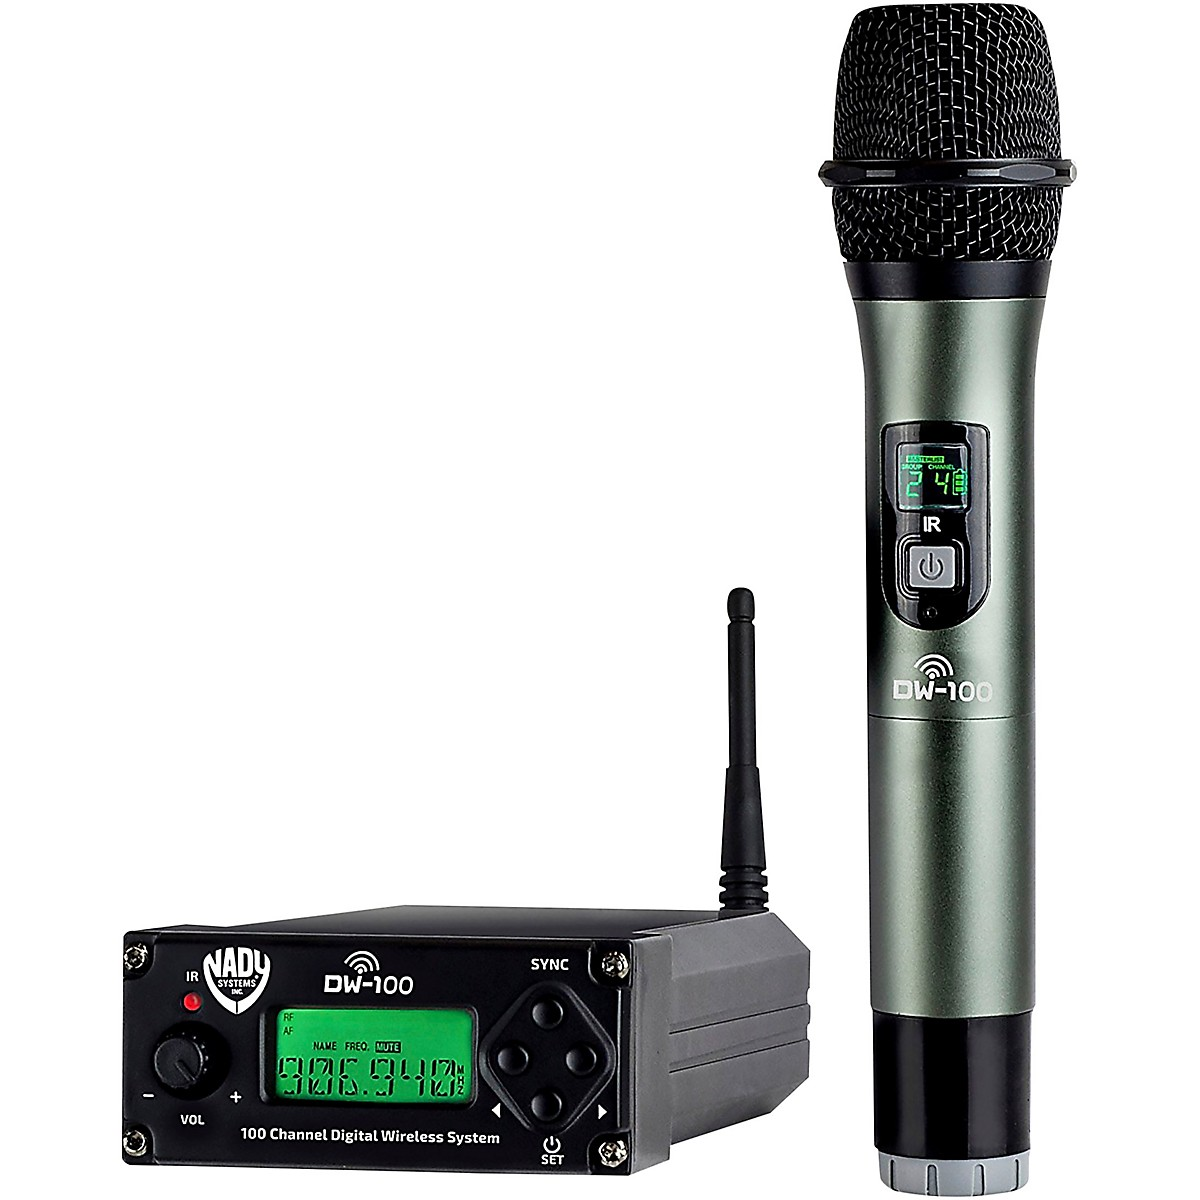 Nady DW-100 - 100-Channel Digital Handheld Wireless Microphone